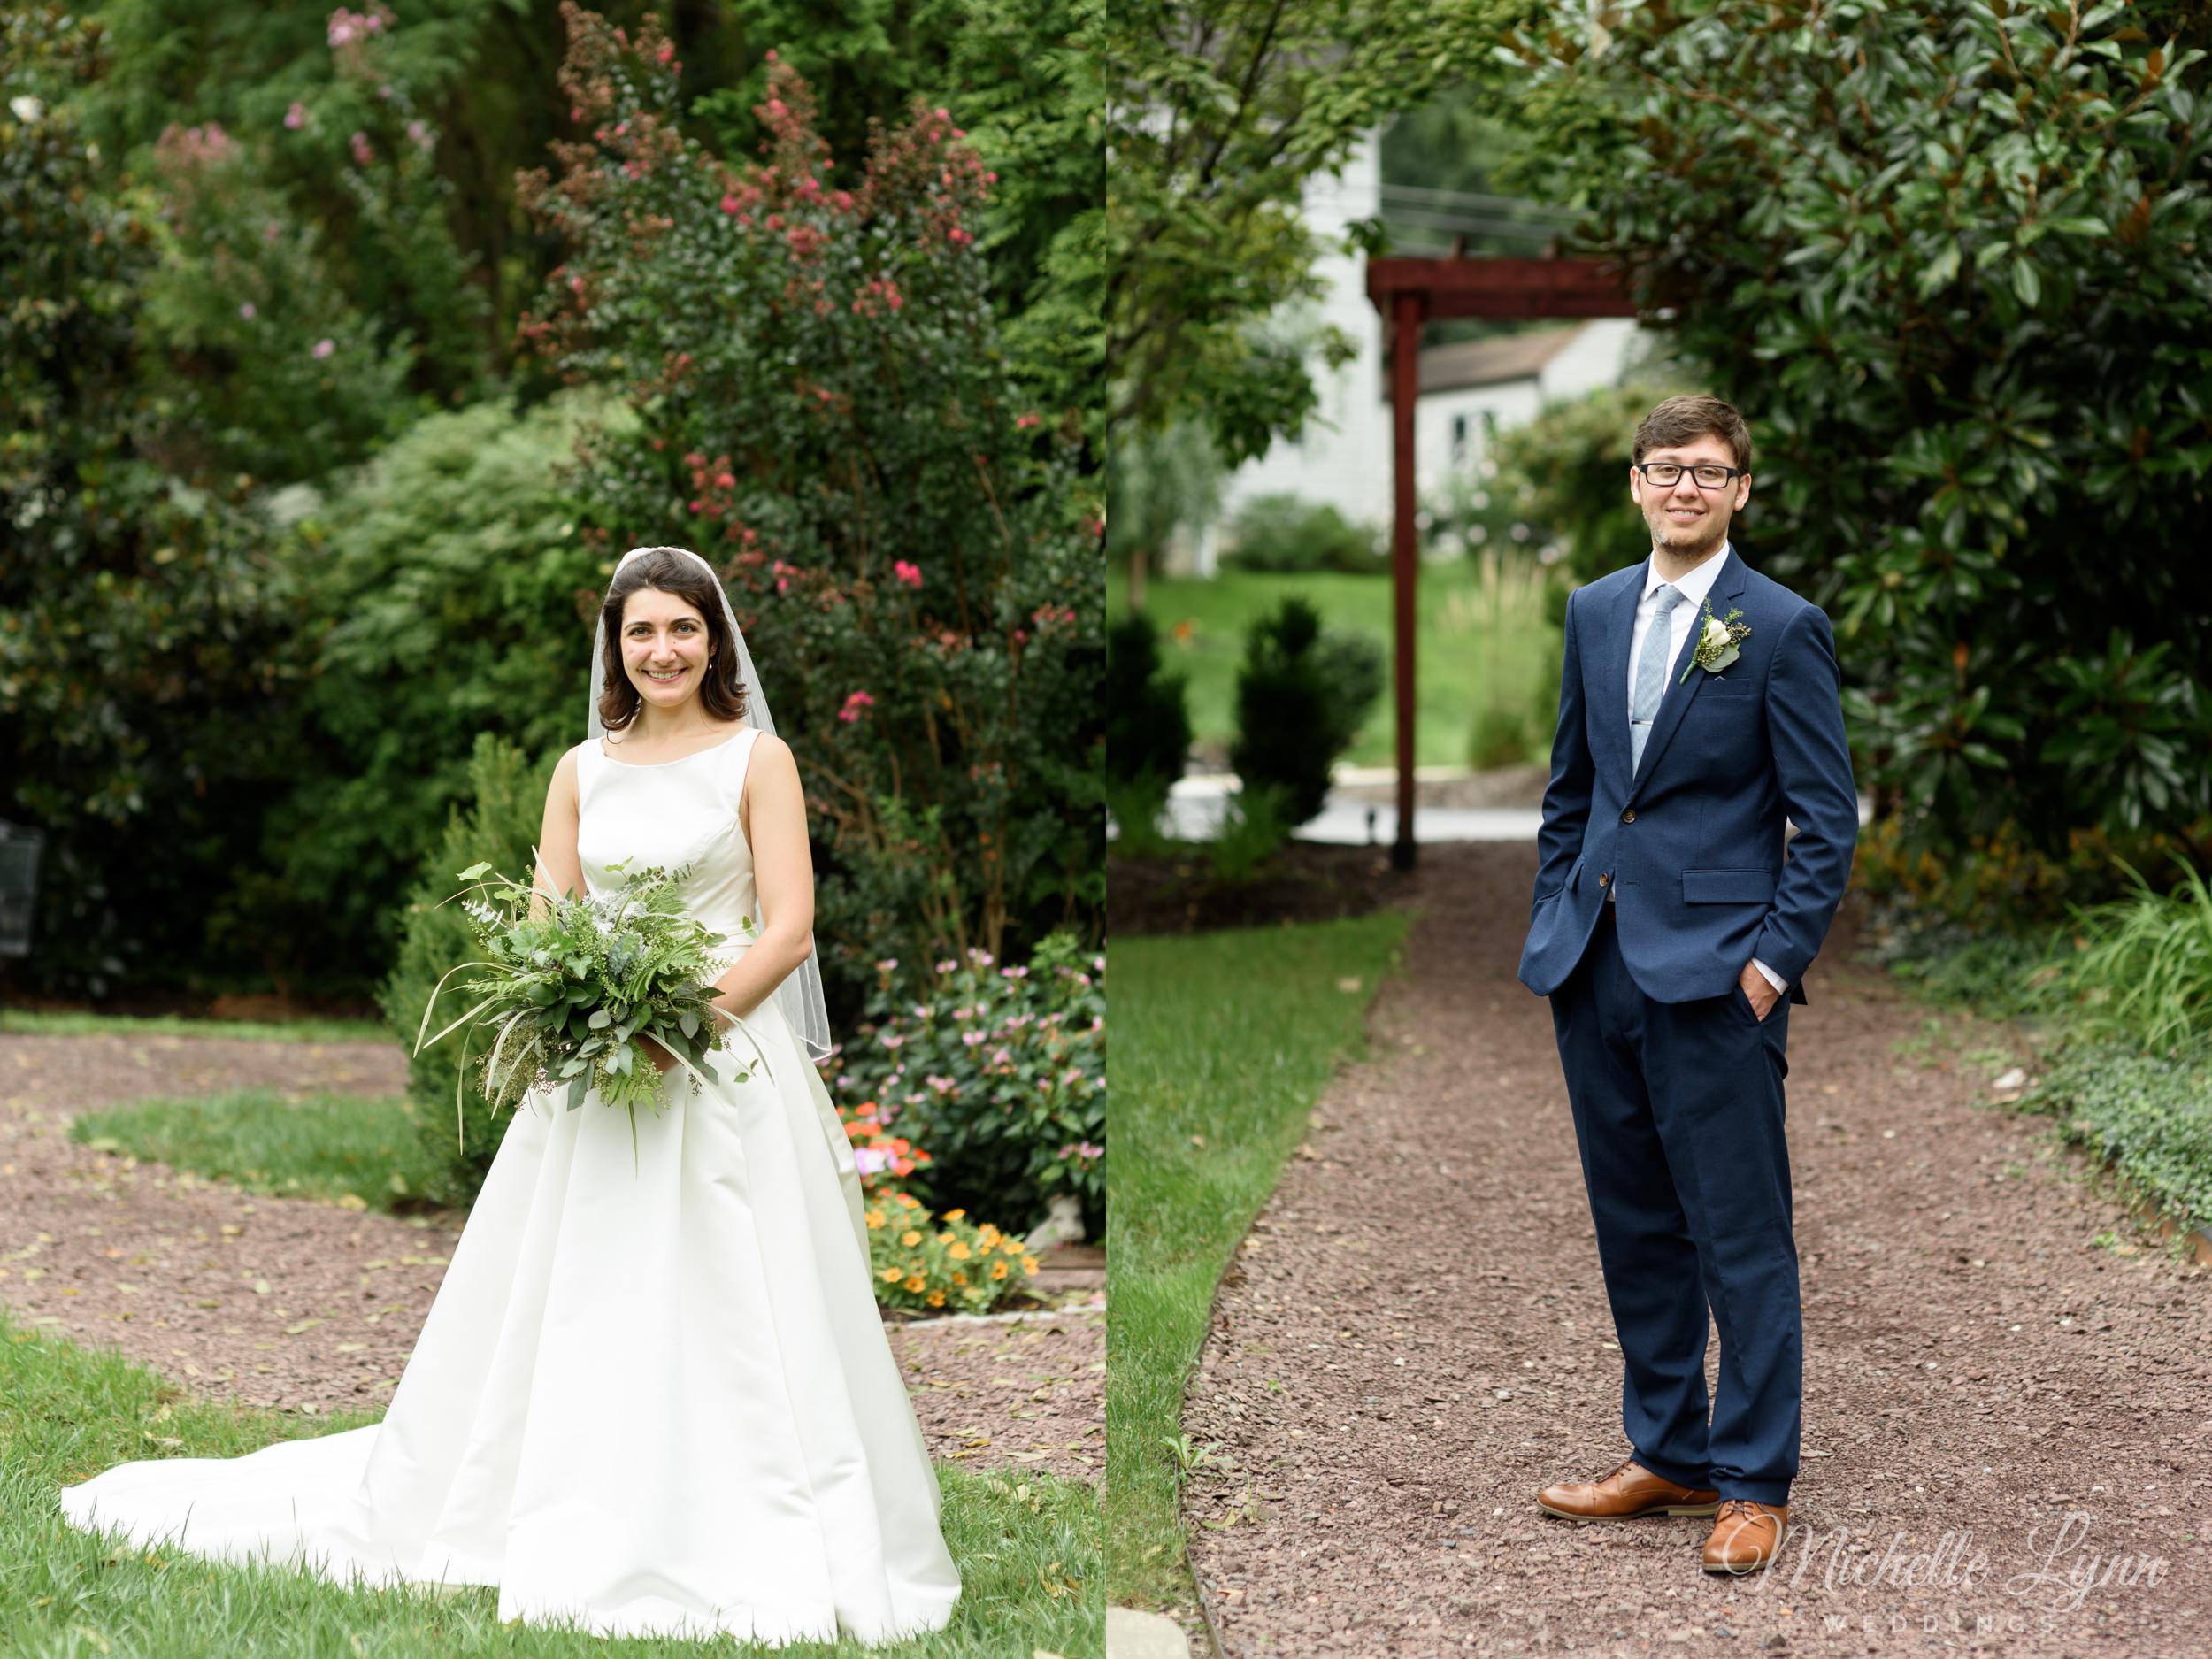 mlw-general-warren-malvern-wedding-photographer-31.jpg